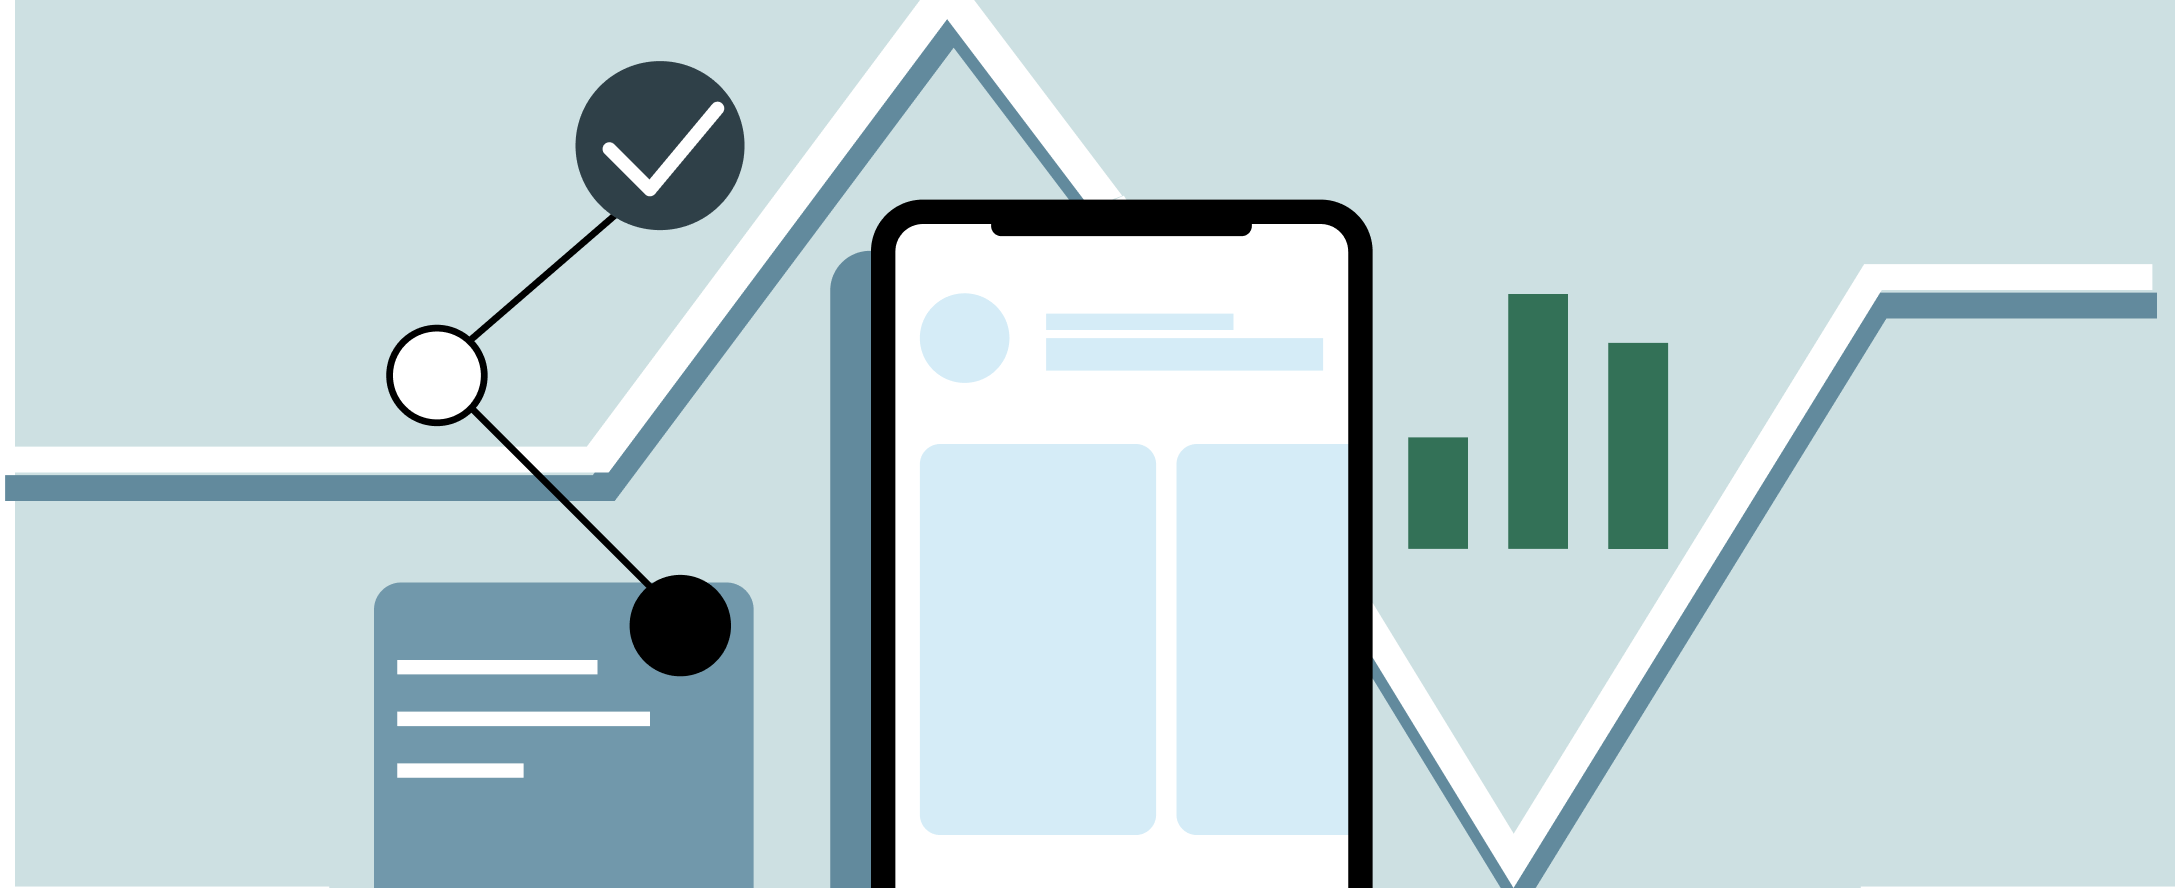 8 Strategies To Increase App Retention1